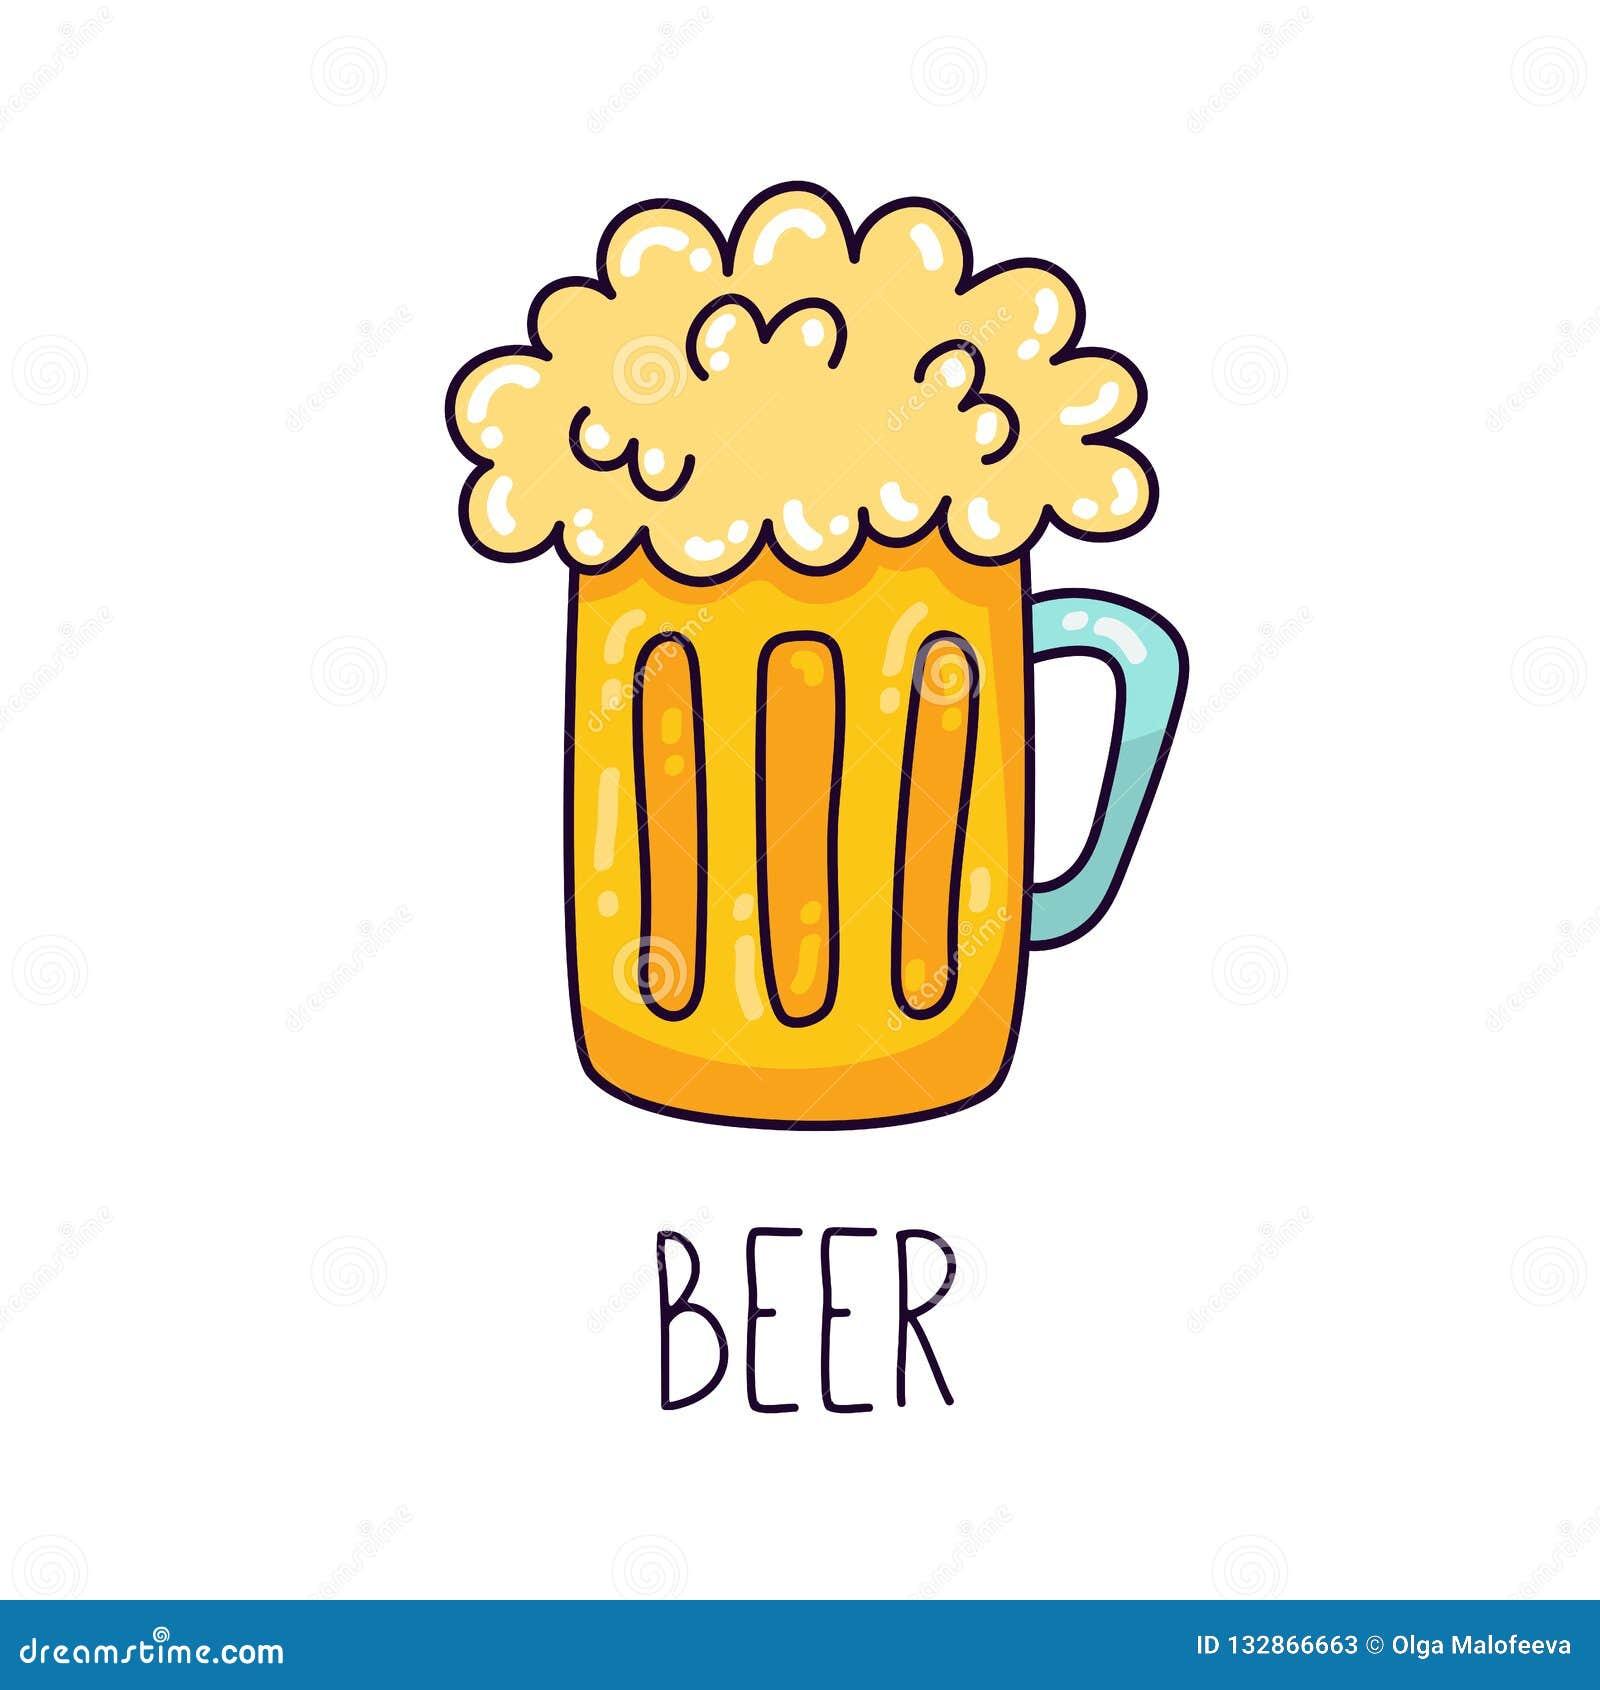 Beer Mug Colorful Doodle Vector Icon Stock Vector Illustration Of Menu Doodle 132866663